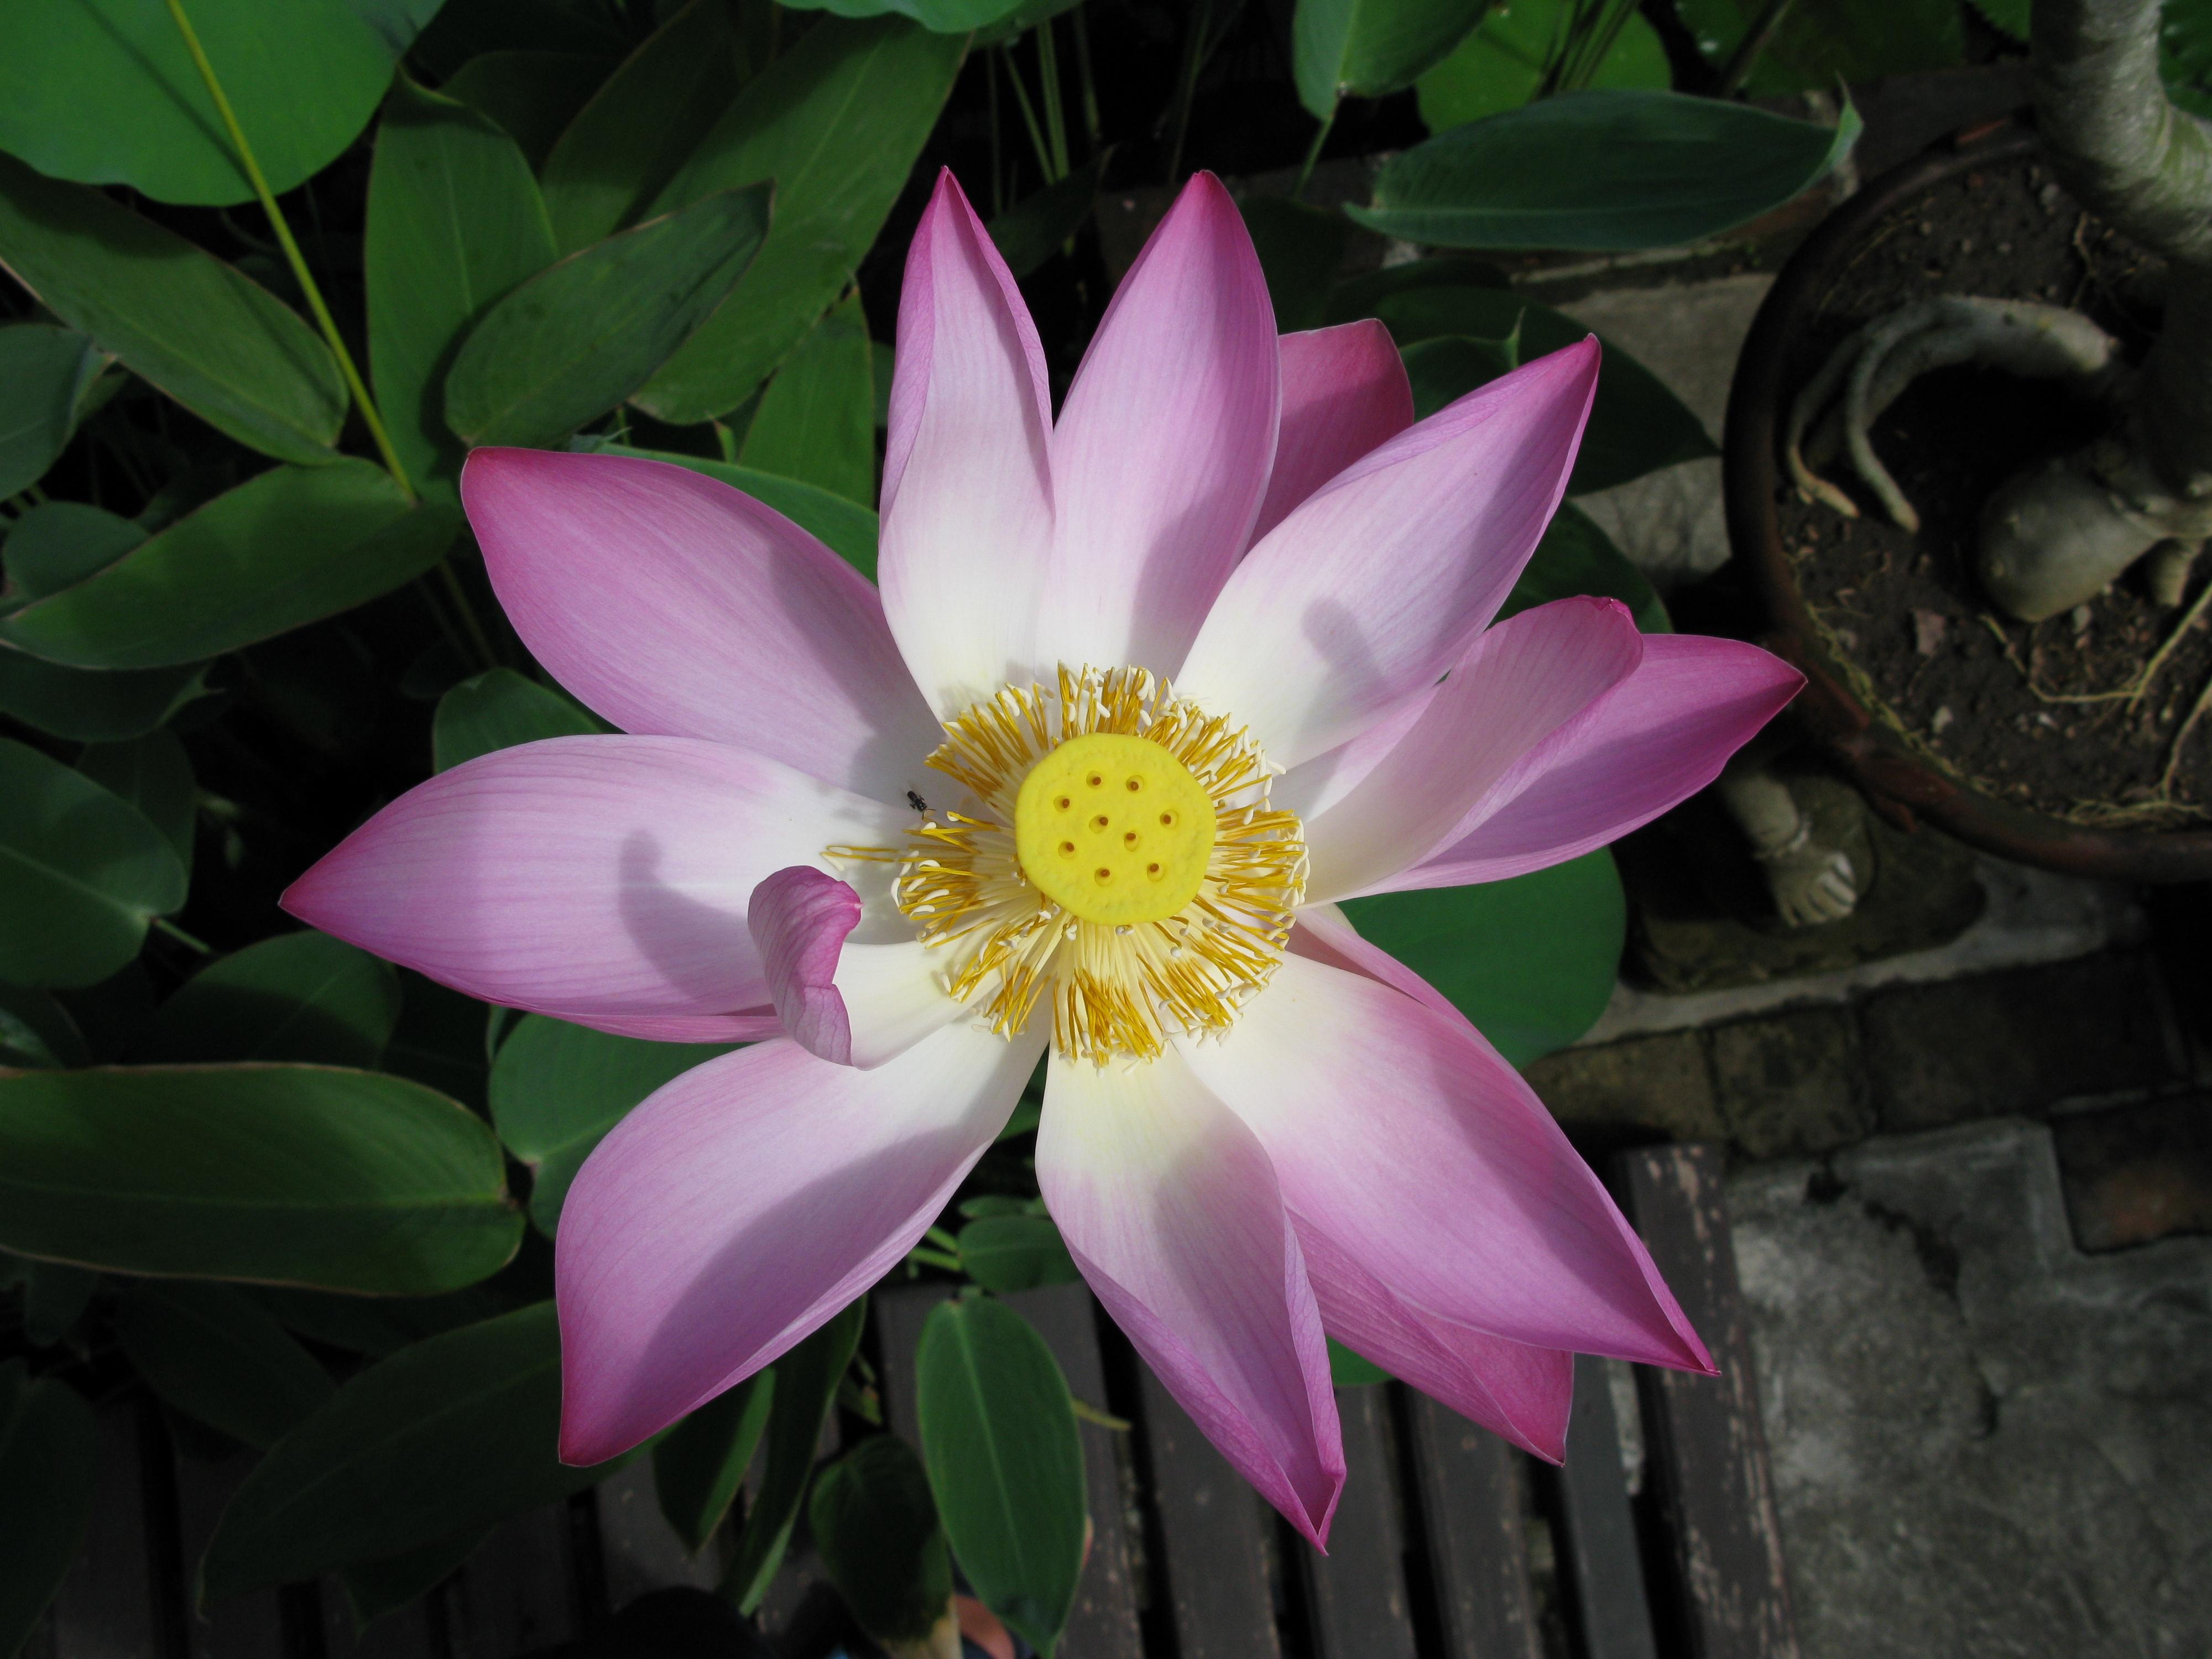 Diethild-Medina-Yoga-Blume